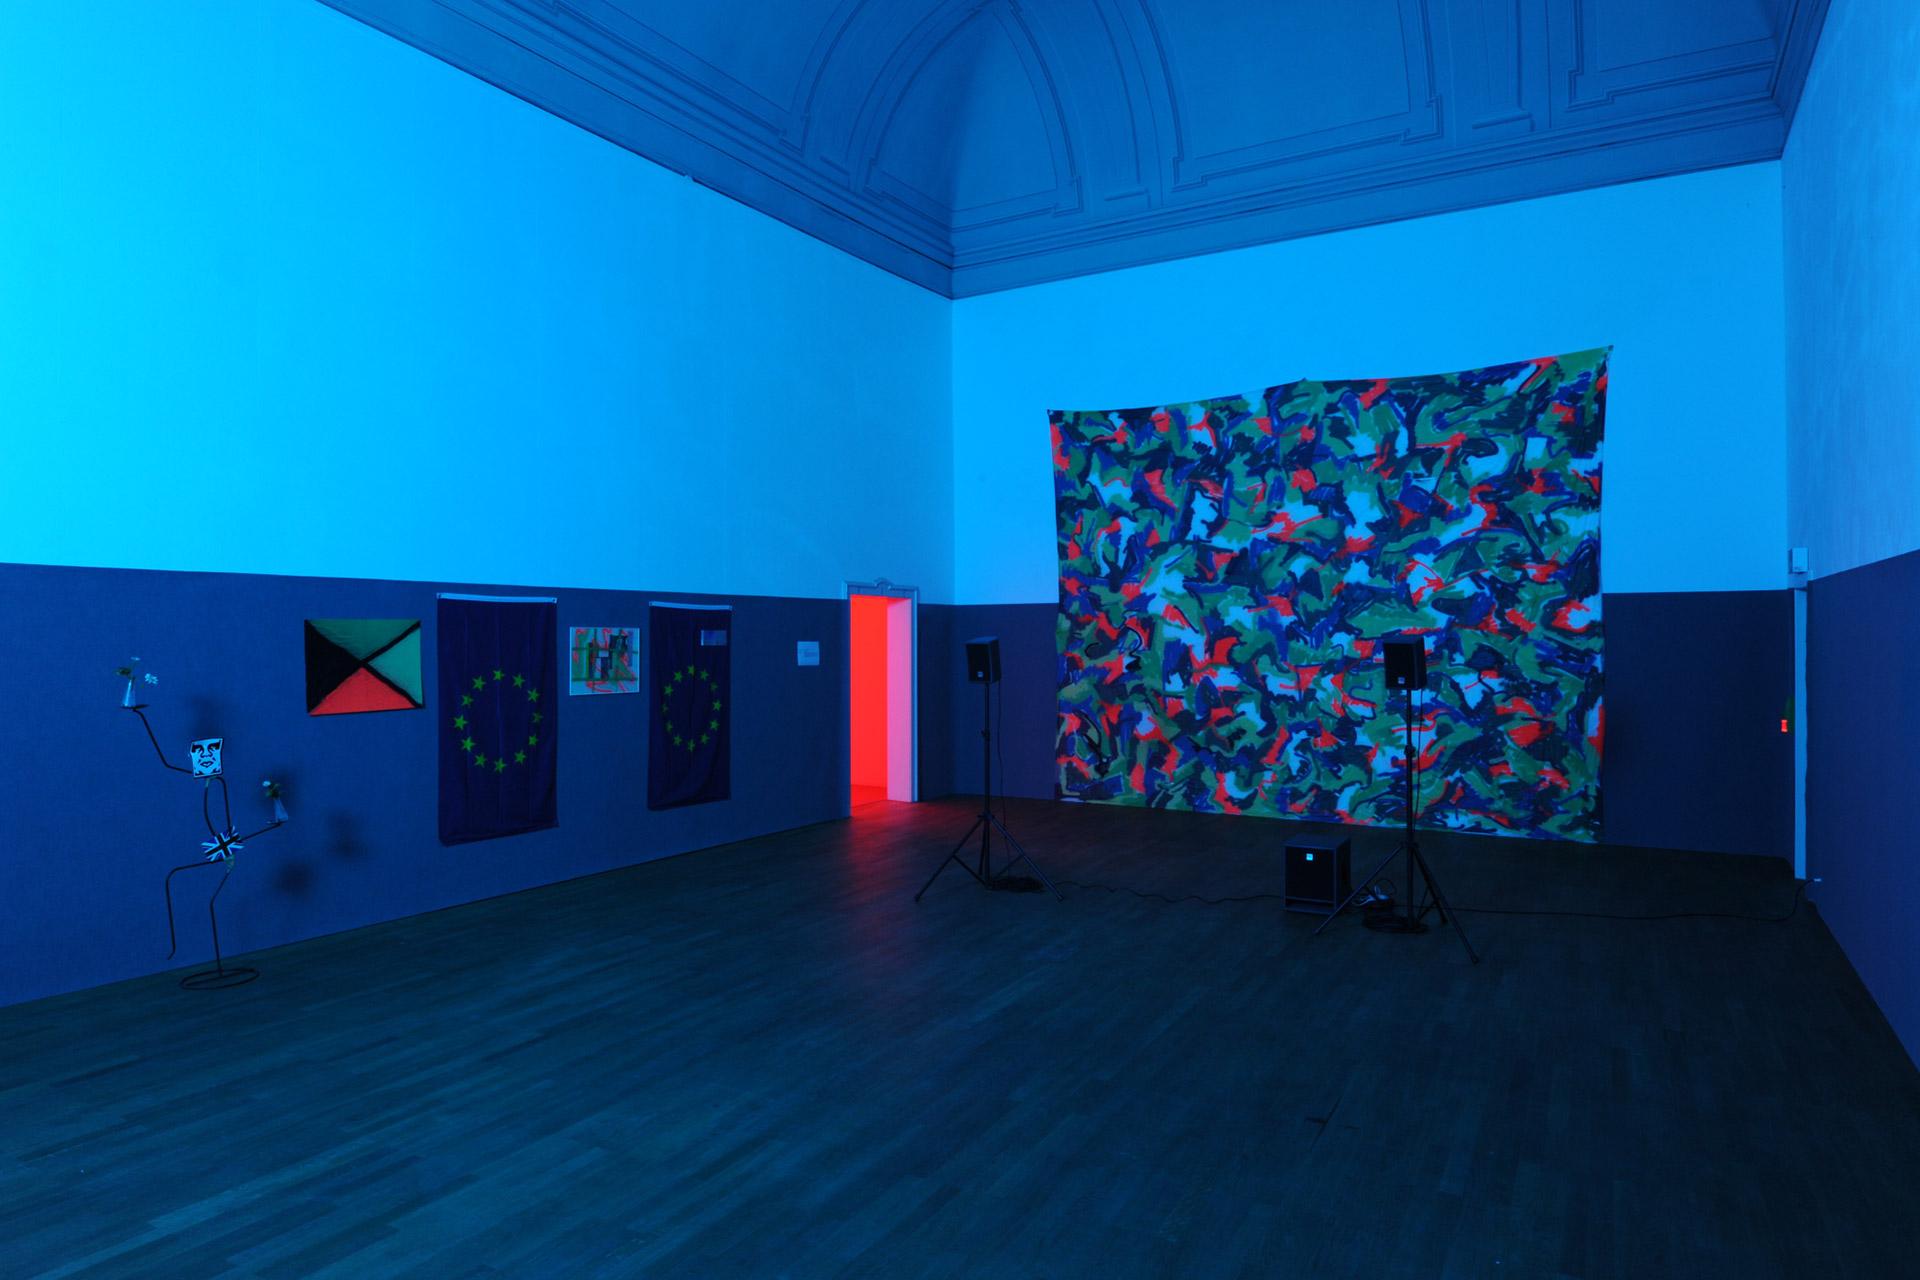 Richard-Sides-Kunsthalle-Winterthur-2014-2.jpg